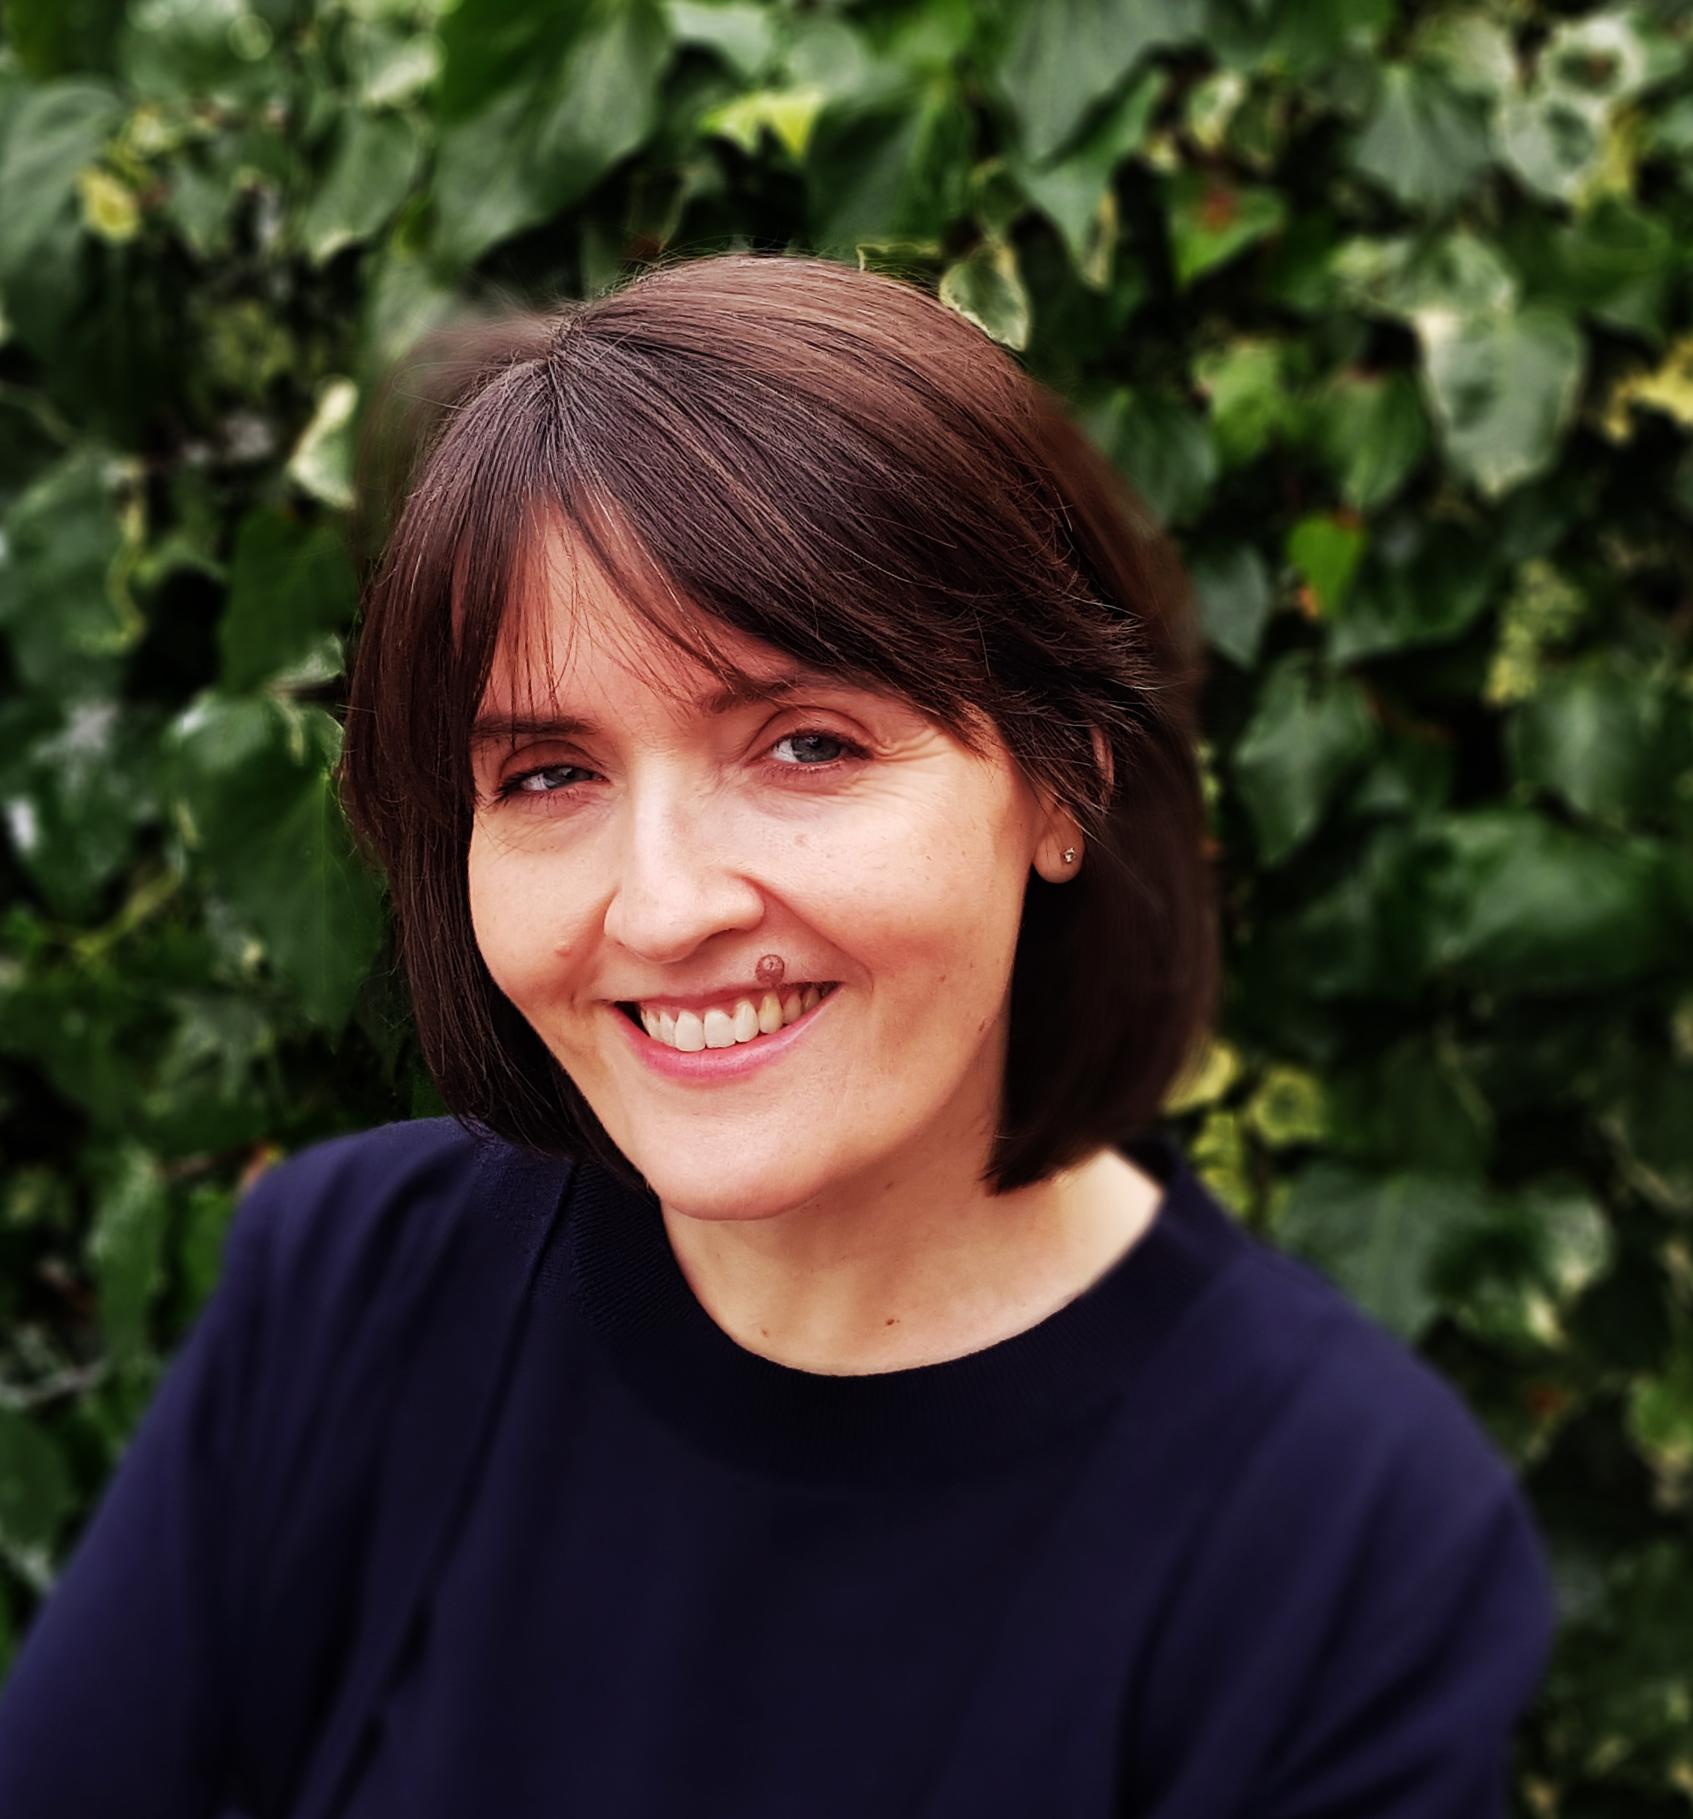 In conversation with Carolyn O'Brien